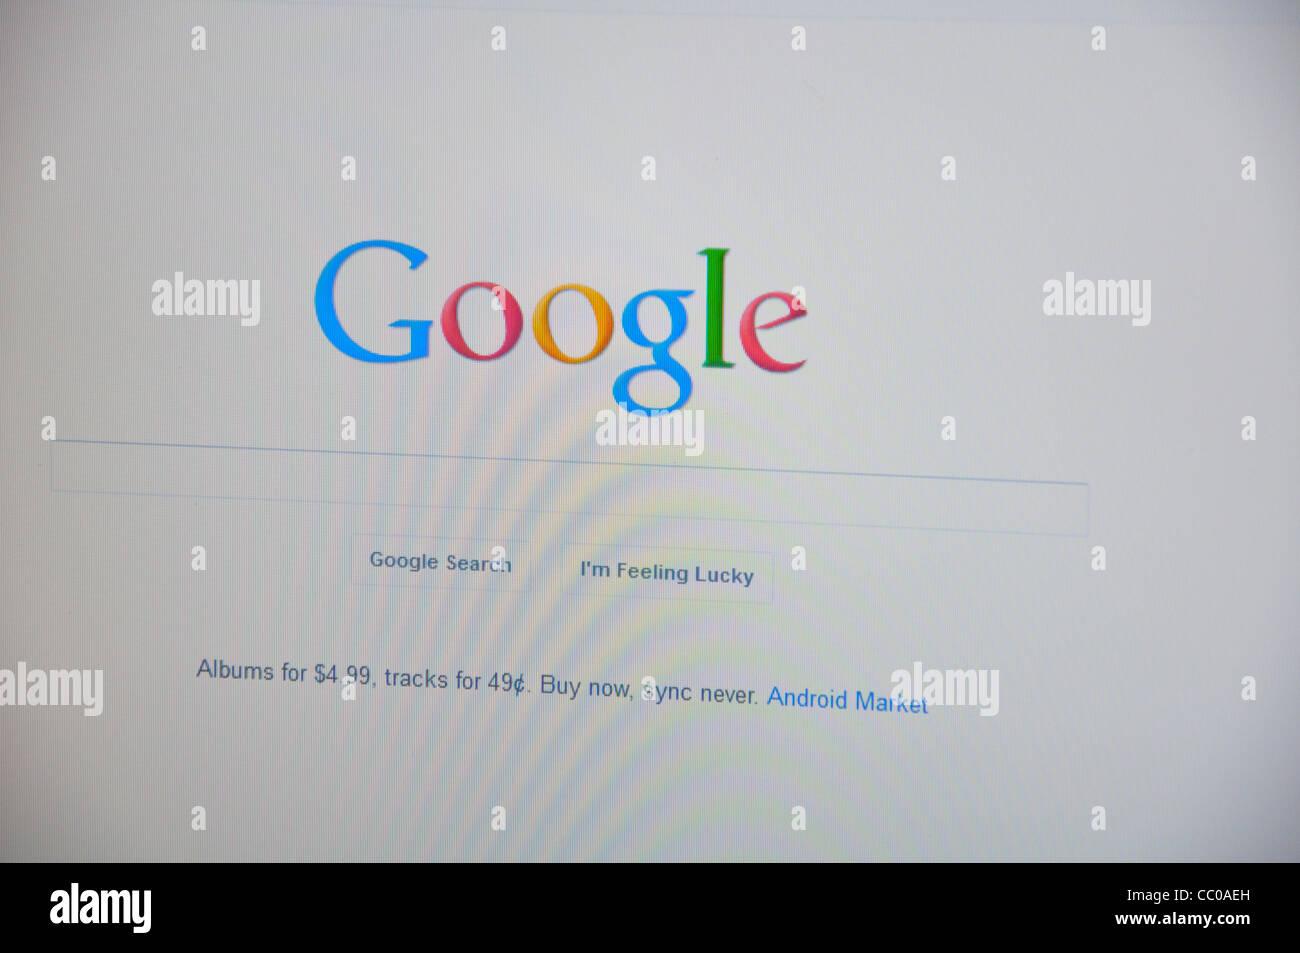 Google website screenshot - Stock Image